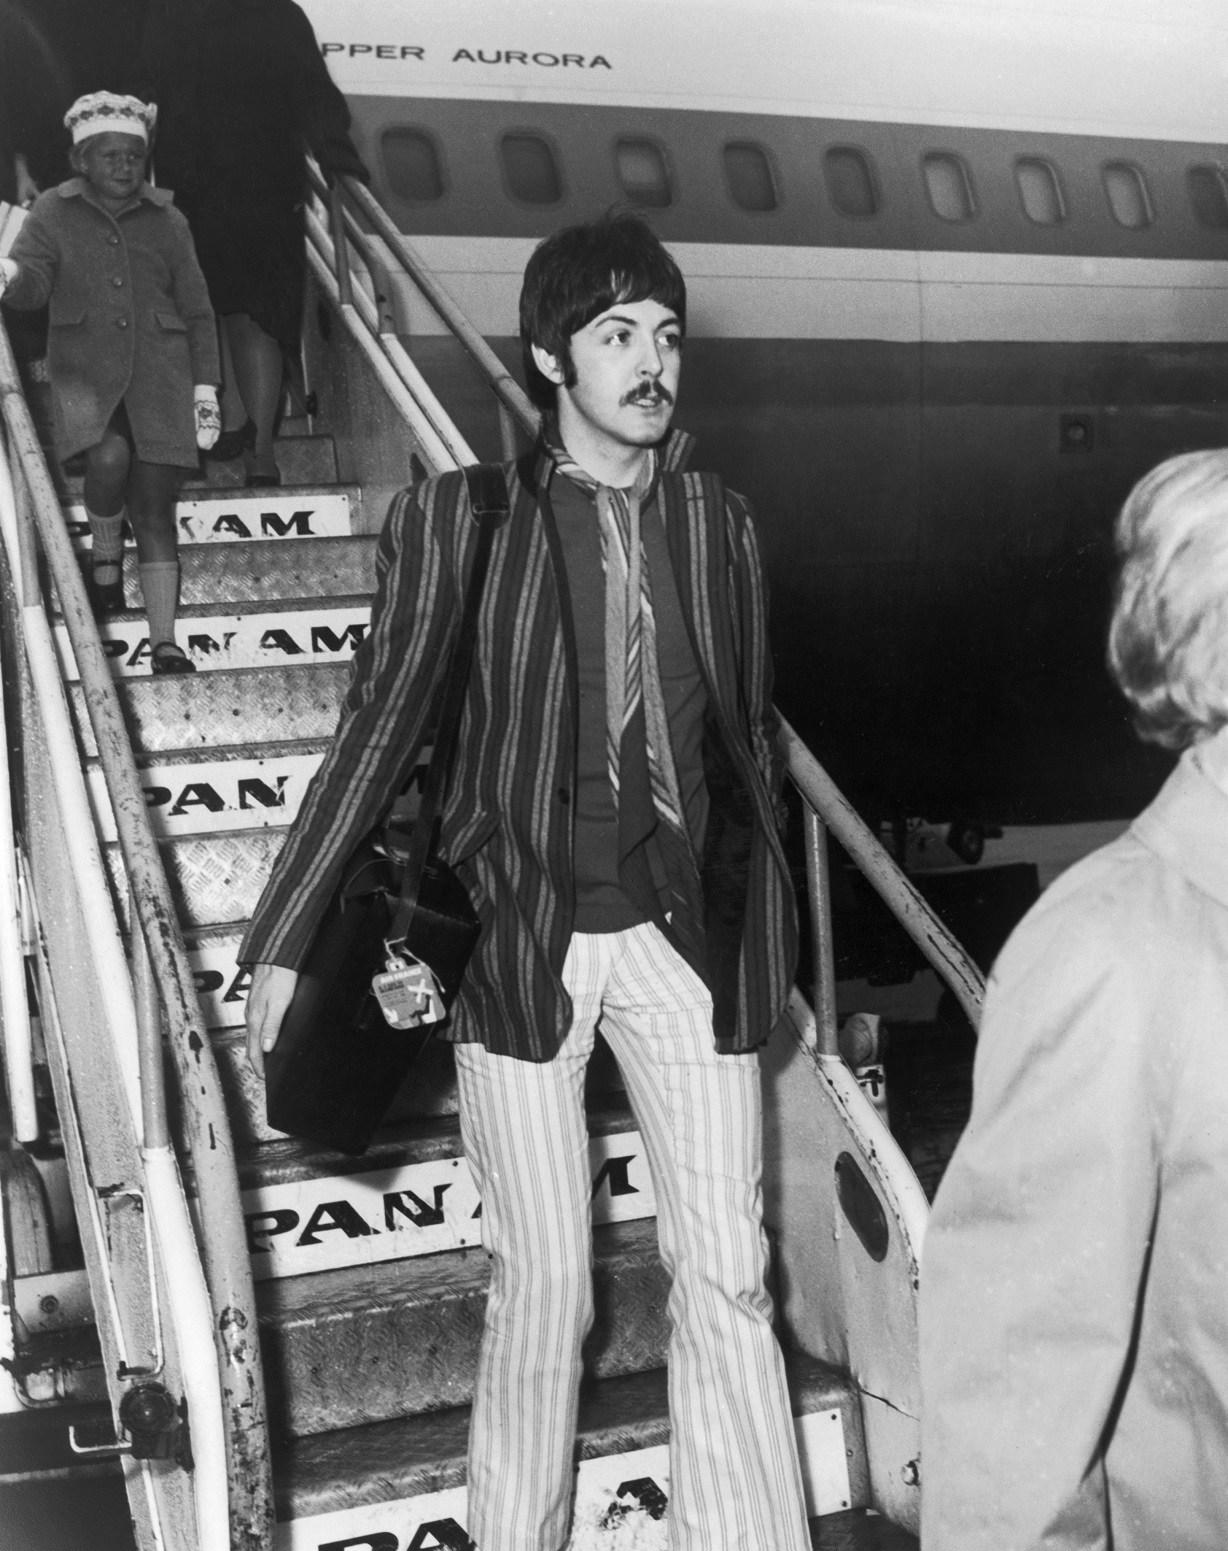 Paul McCartney of the Beatles steps off a Pan Am flight at London Airport